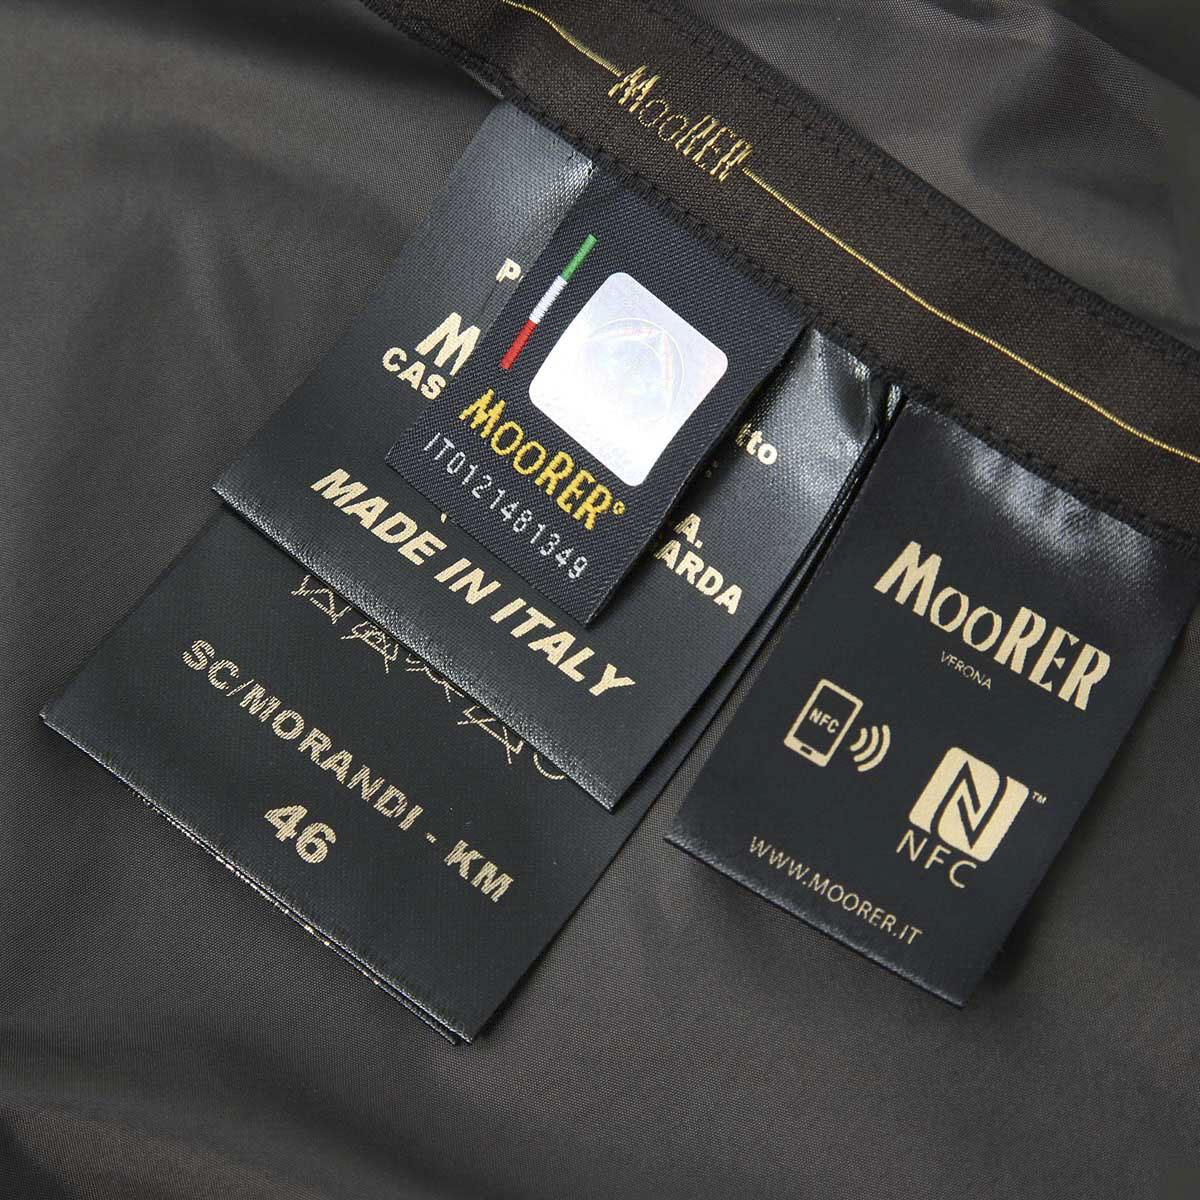 MOORER ムーレー ナイロンコート/SC / MORANDI メンズ